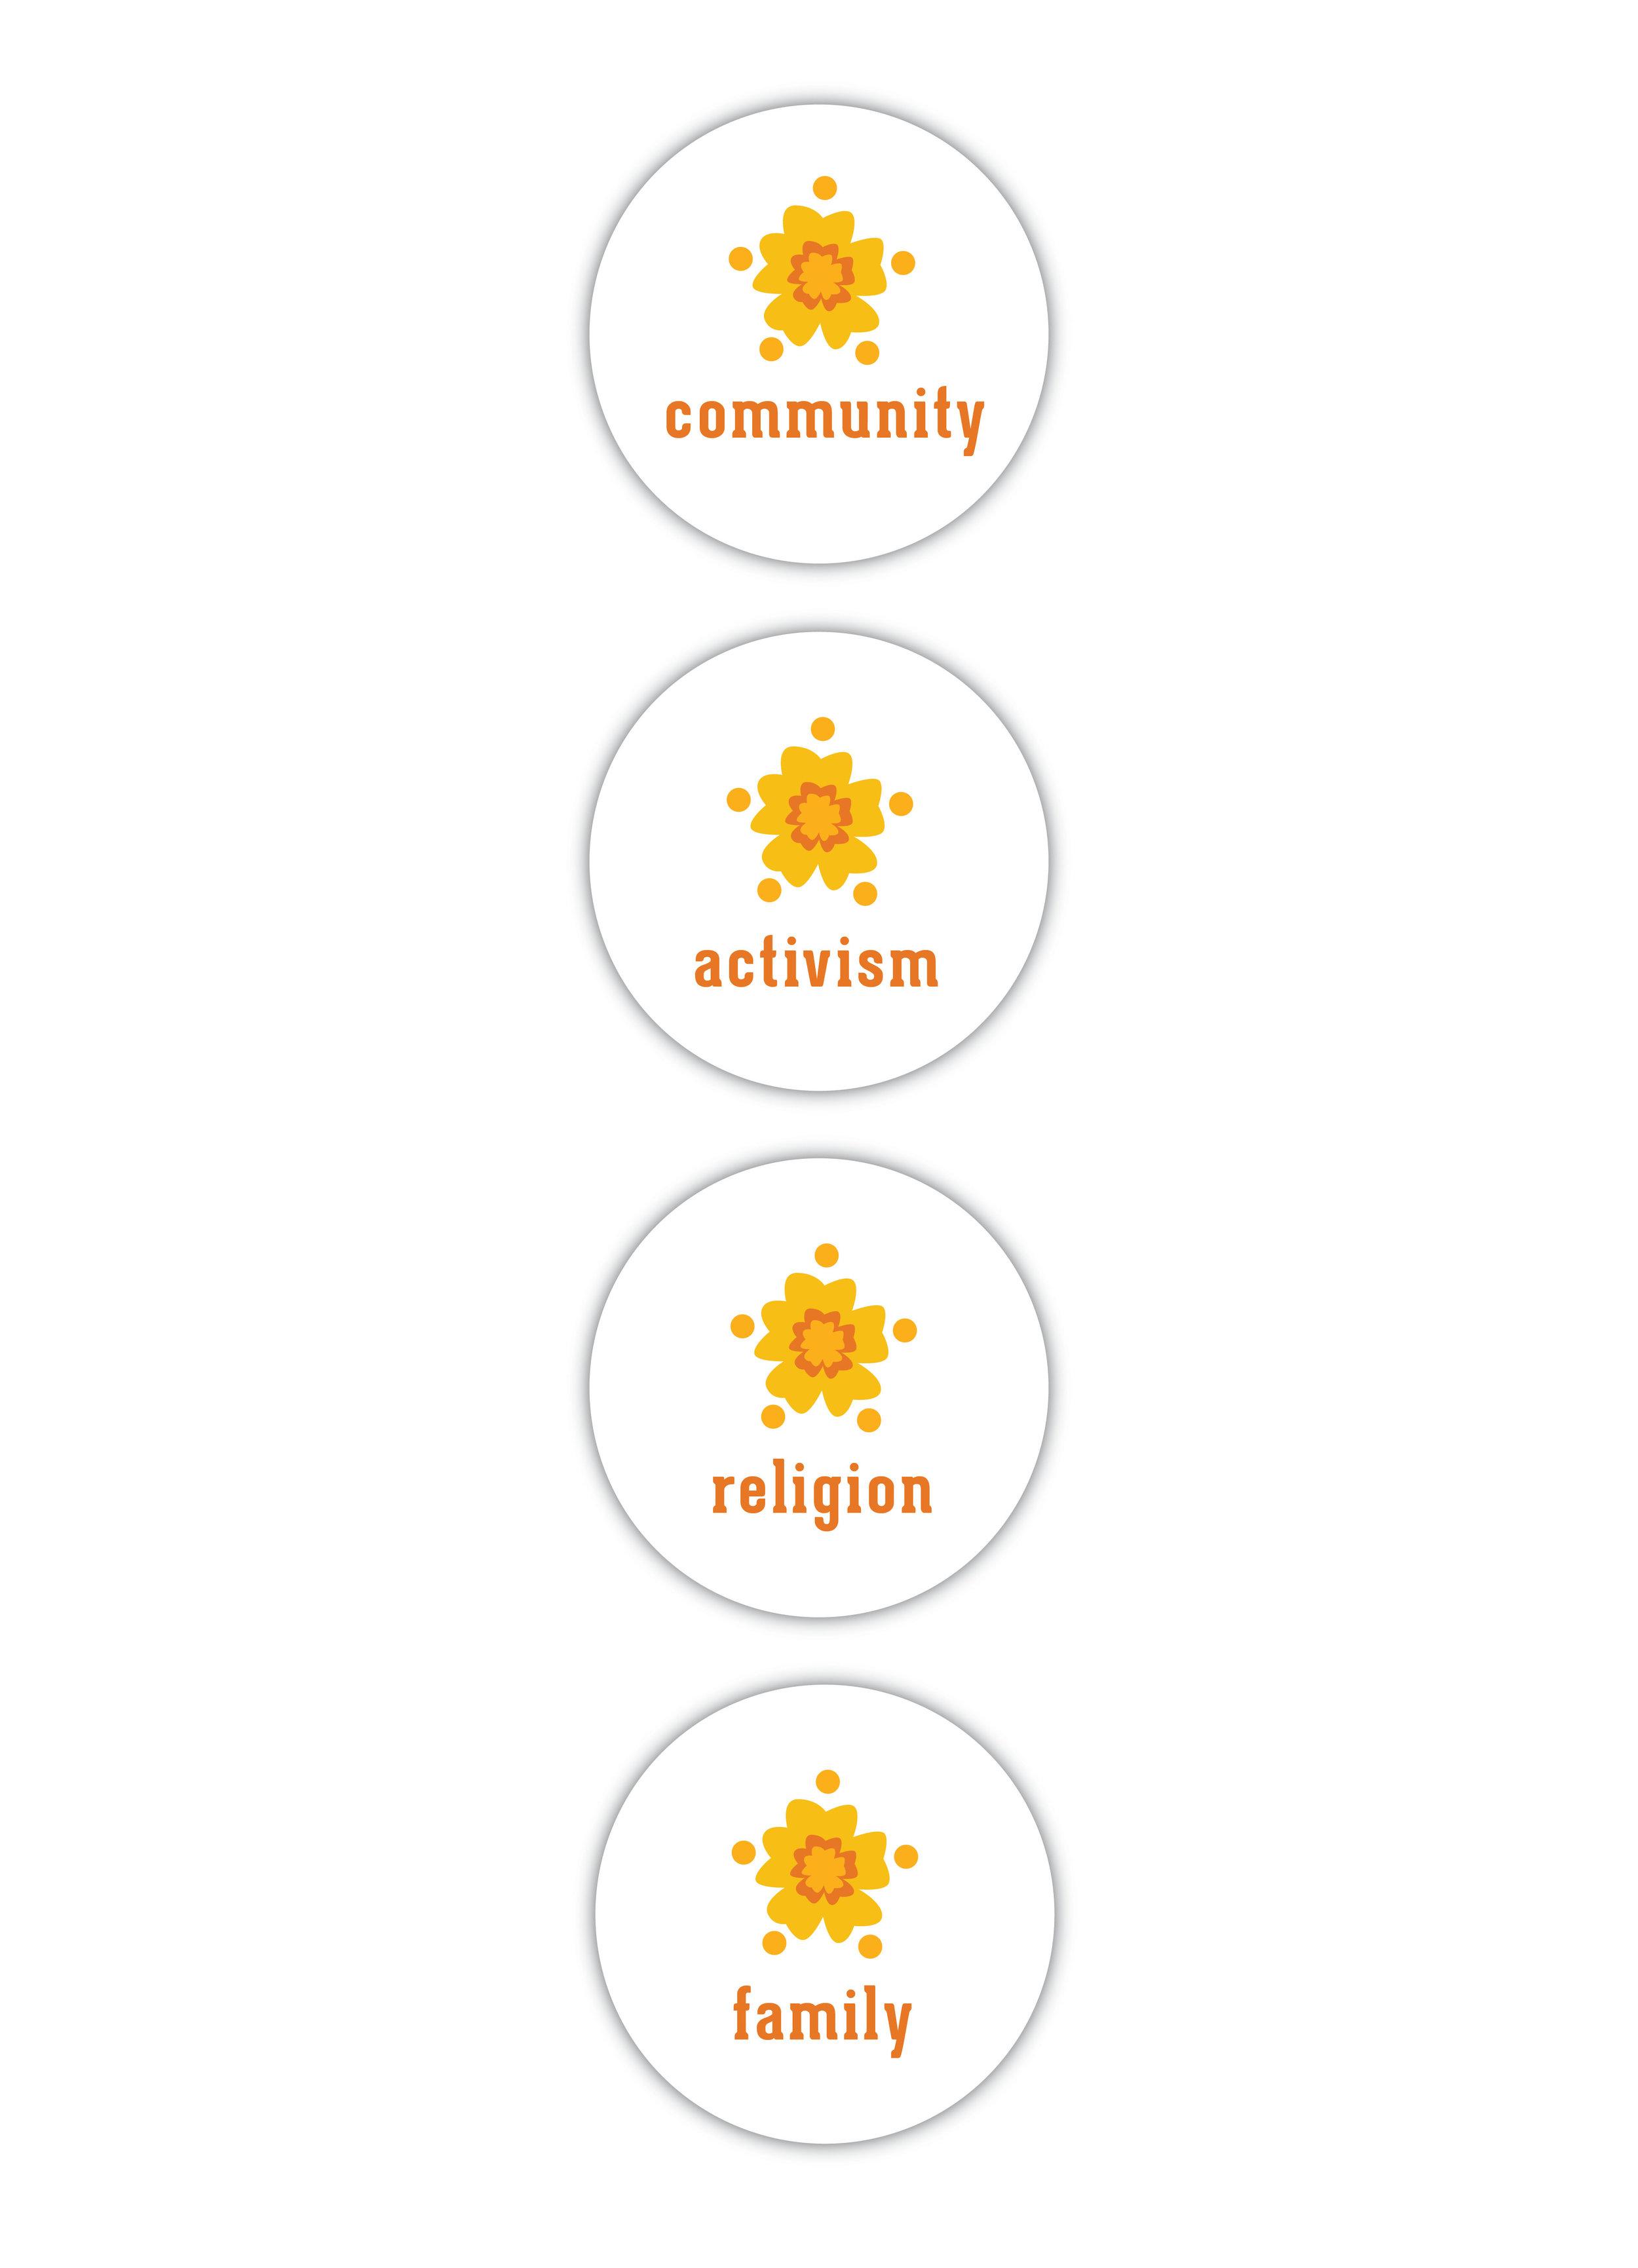 engendering_community_labels.jpg